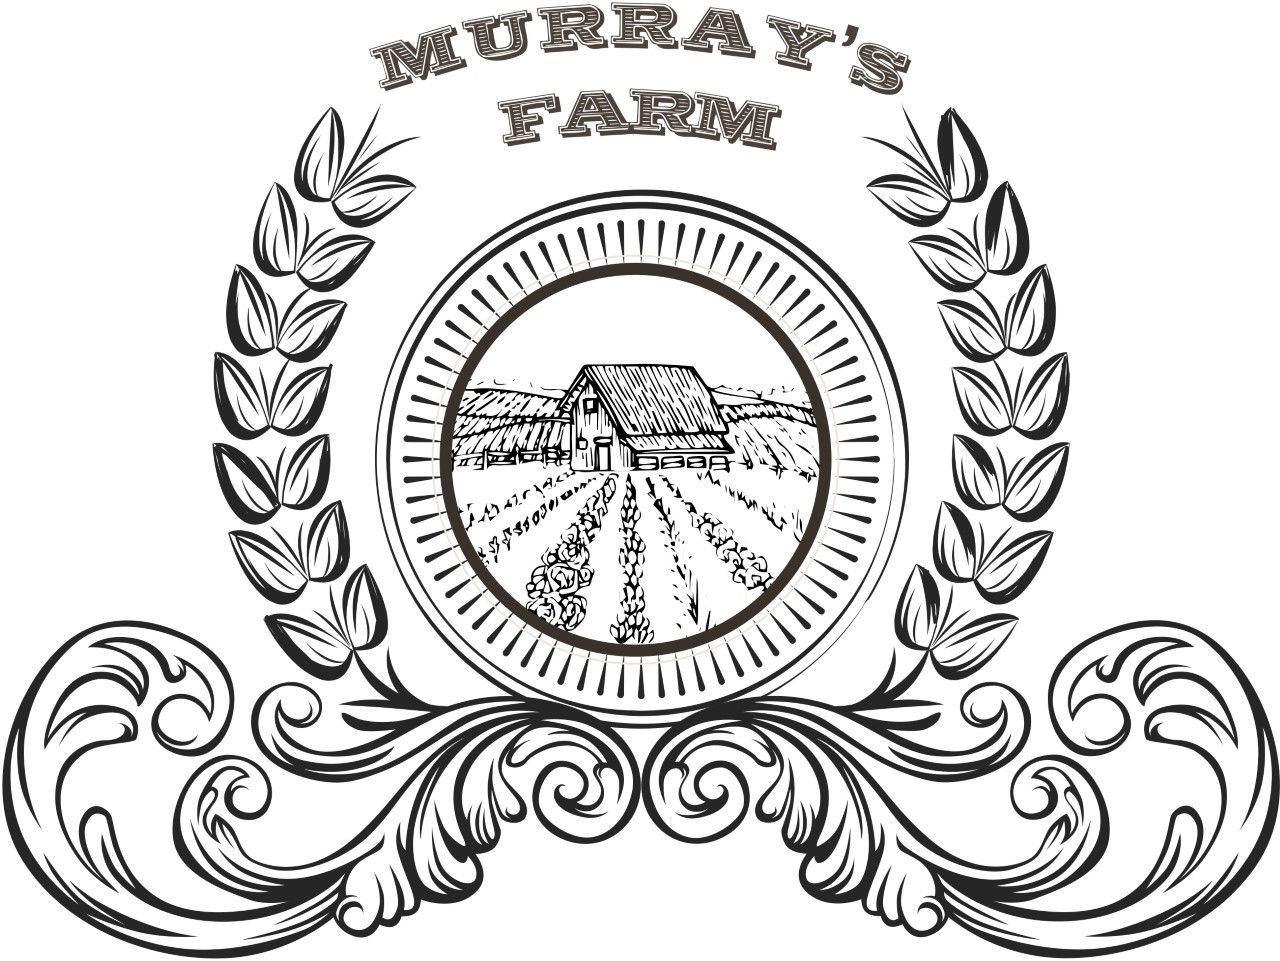 Murray's Farm & Butcher Shoppe